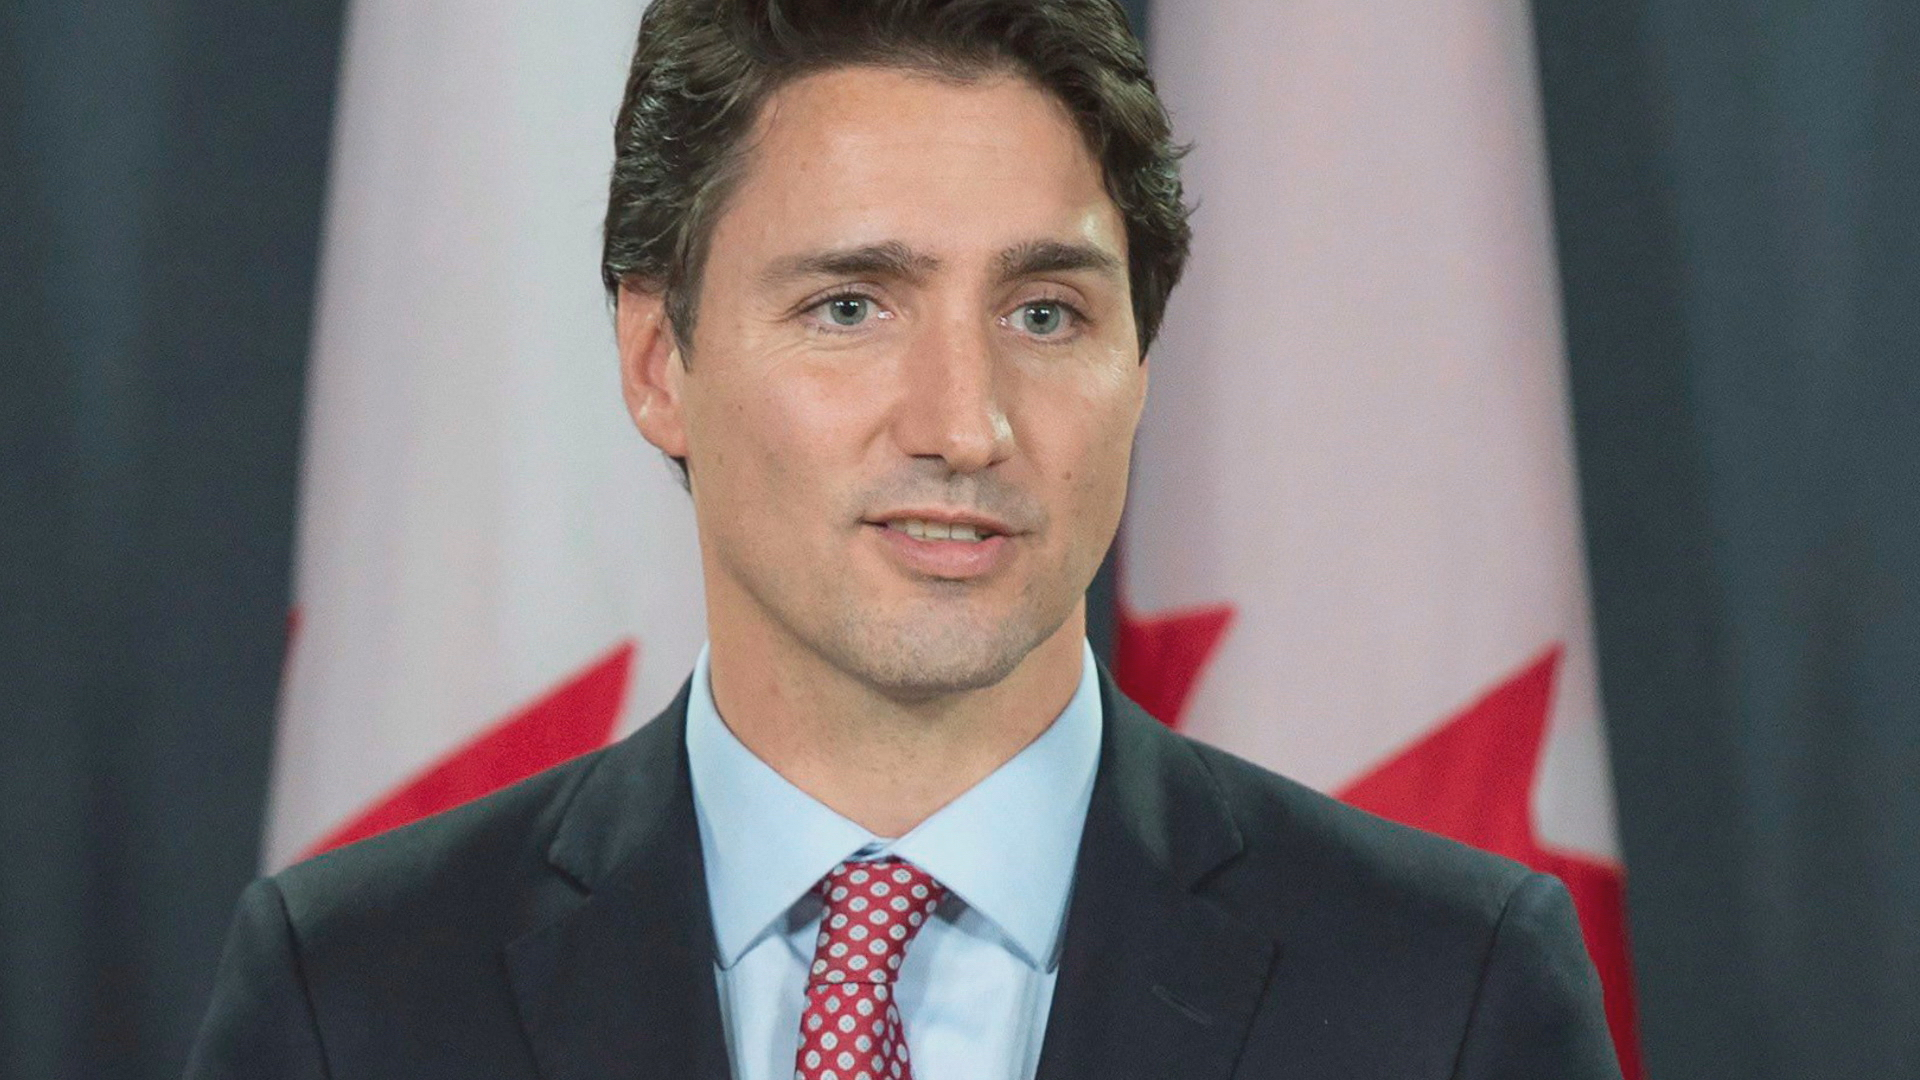 Джастин Трюдо, премьер-министр Канады. Фото: cbc.ca